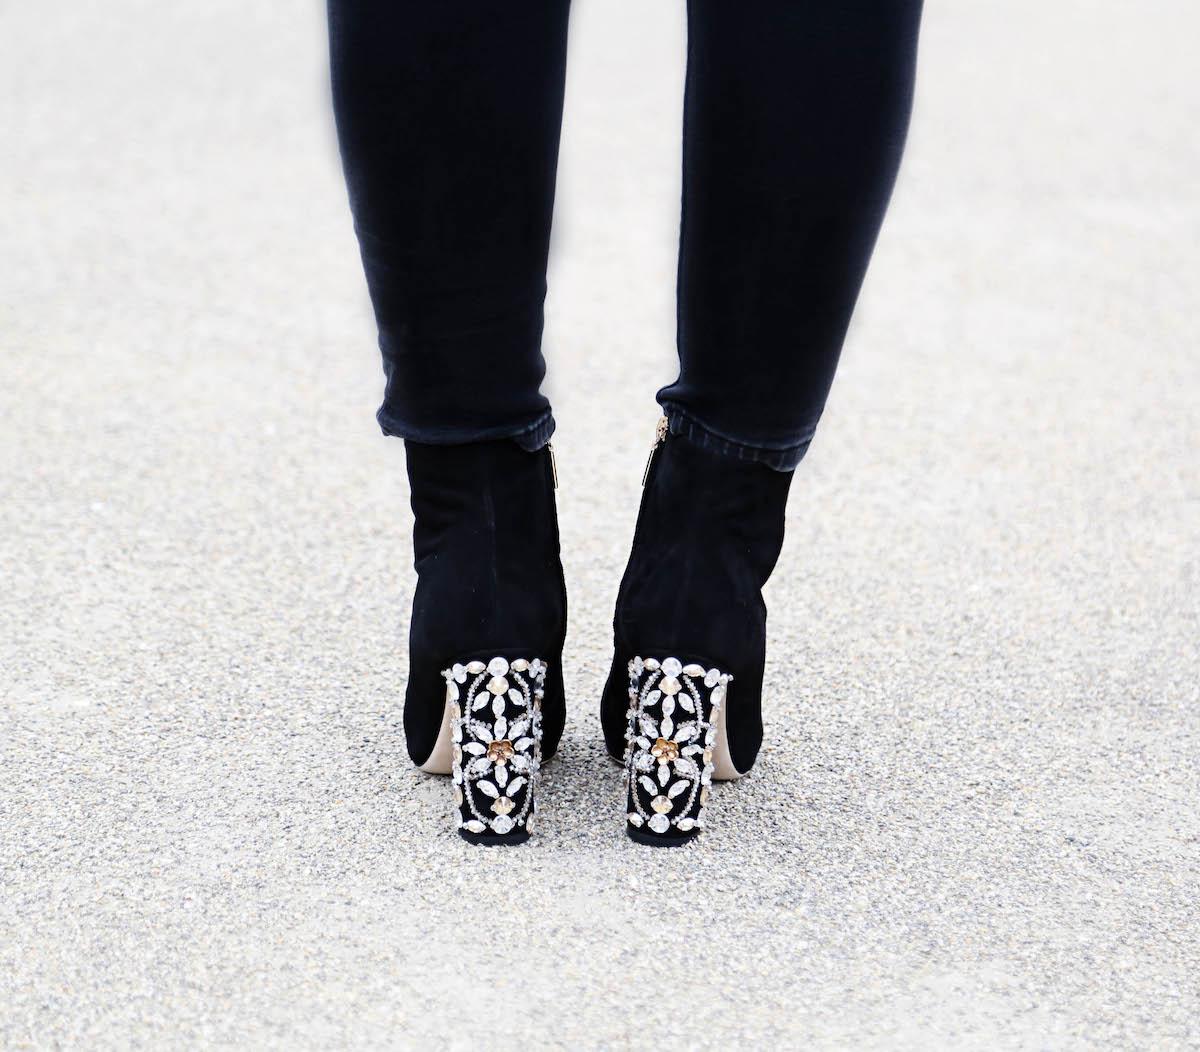 dolce-gabbana-ankle-boots-schuhe-embellished-blogger-breuninger-stuttgart